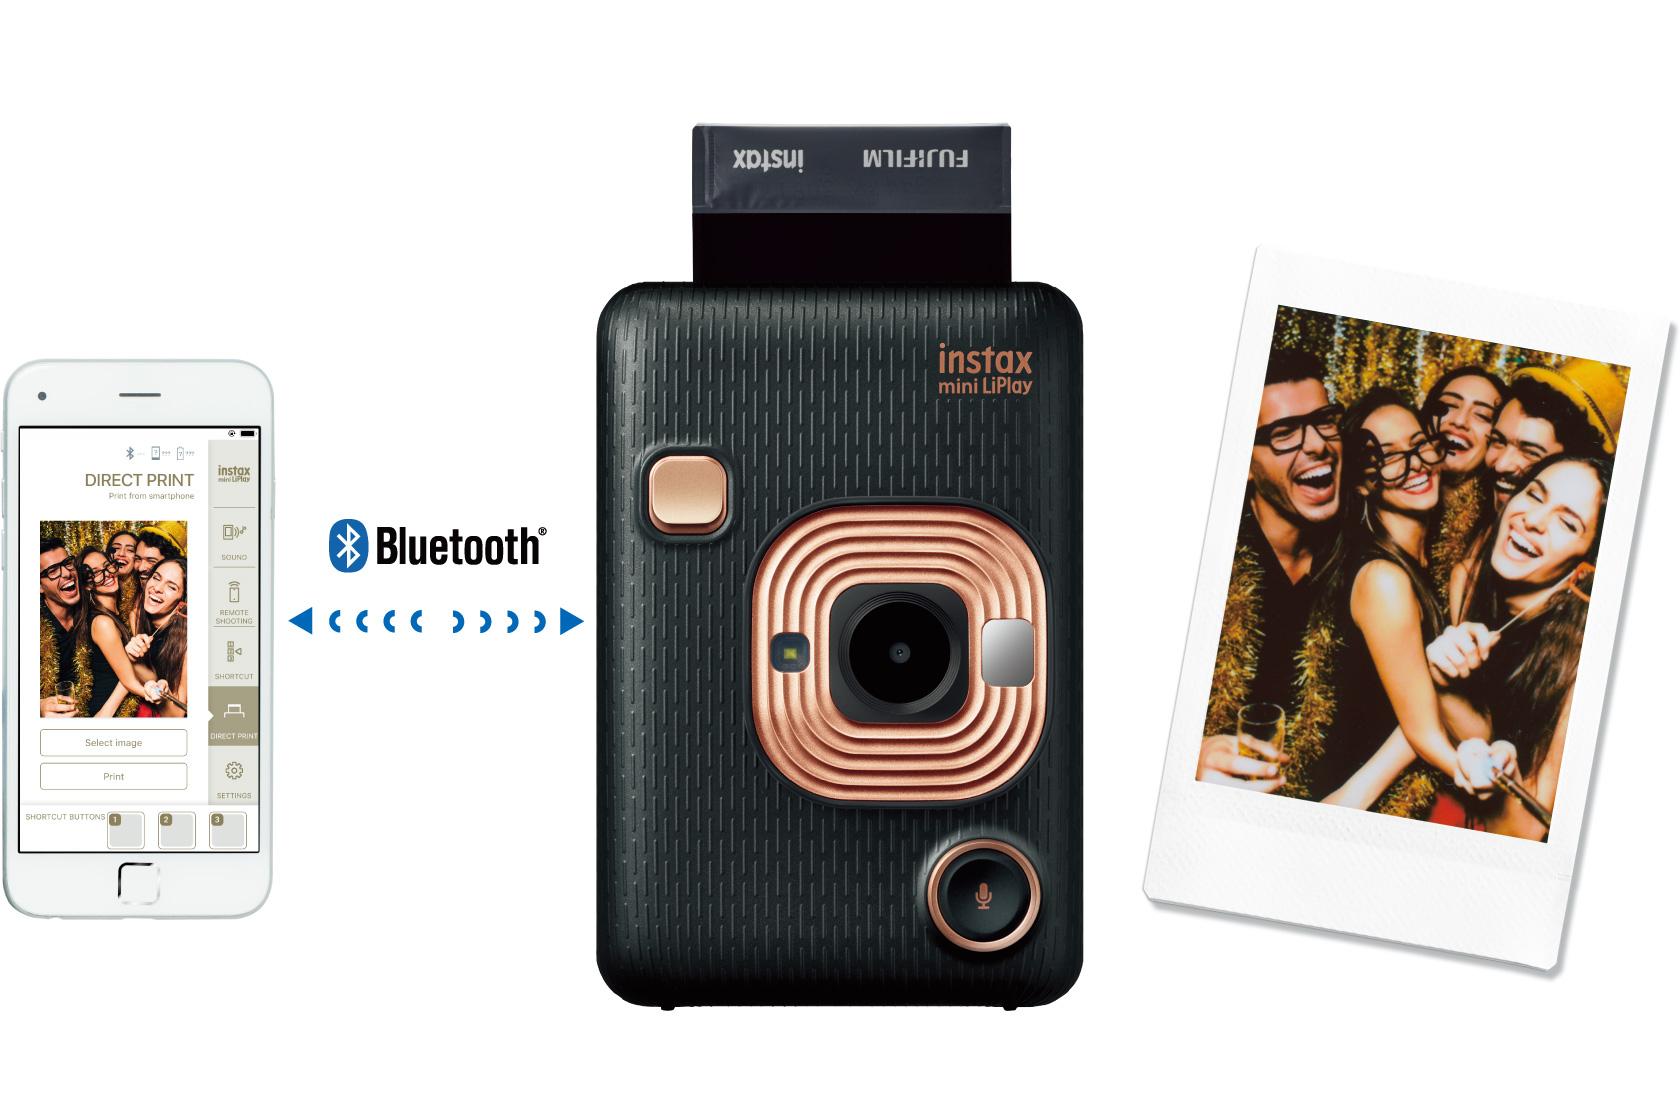 [photo] 모바일 앱에서 인스탁스 미니 리플레이, 최종 사진 인쇄까지 시퀀스 인쇄